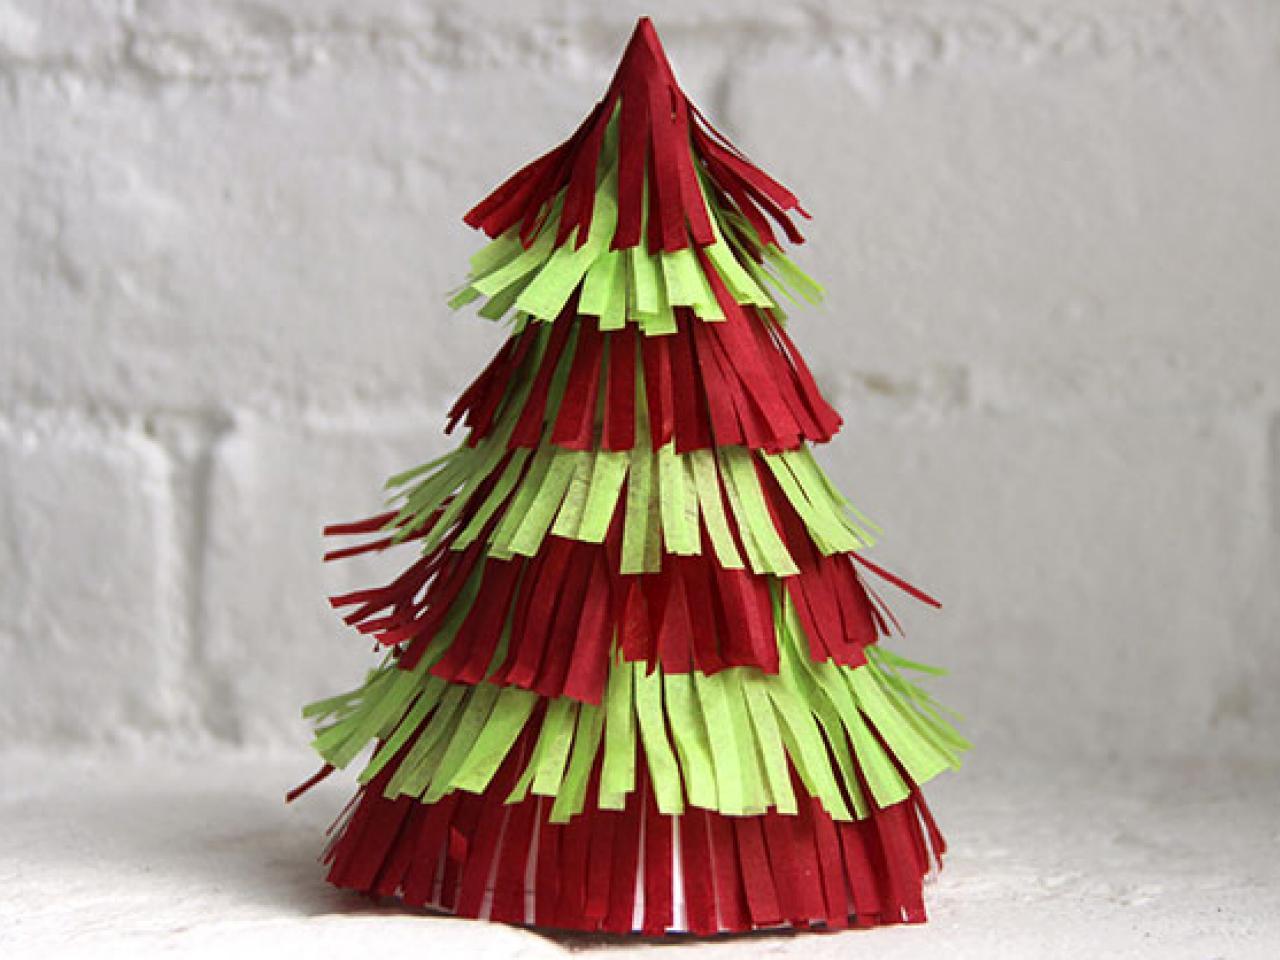 albero natalizio faidate carta